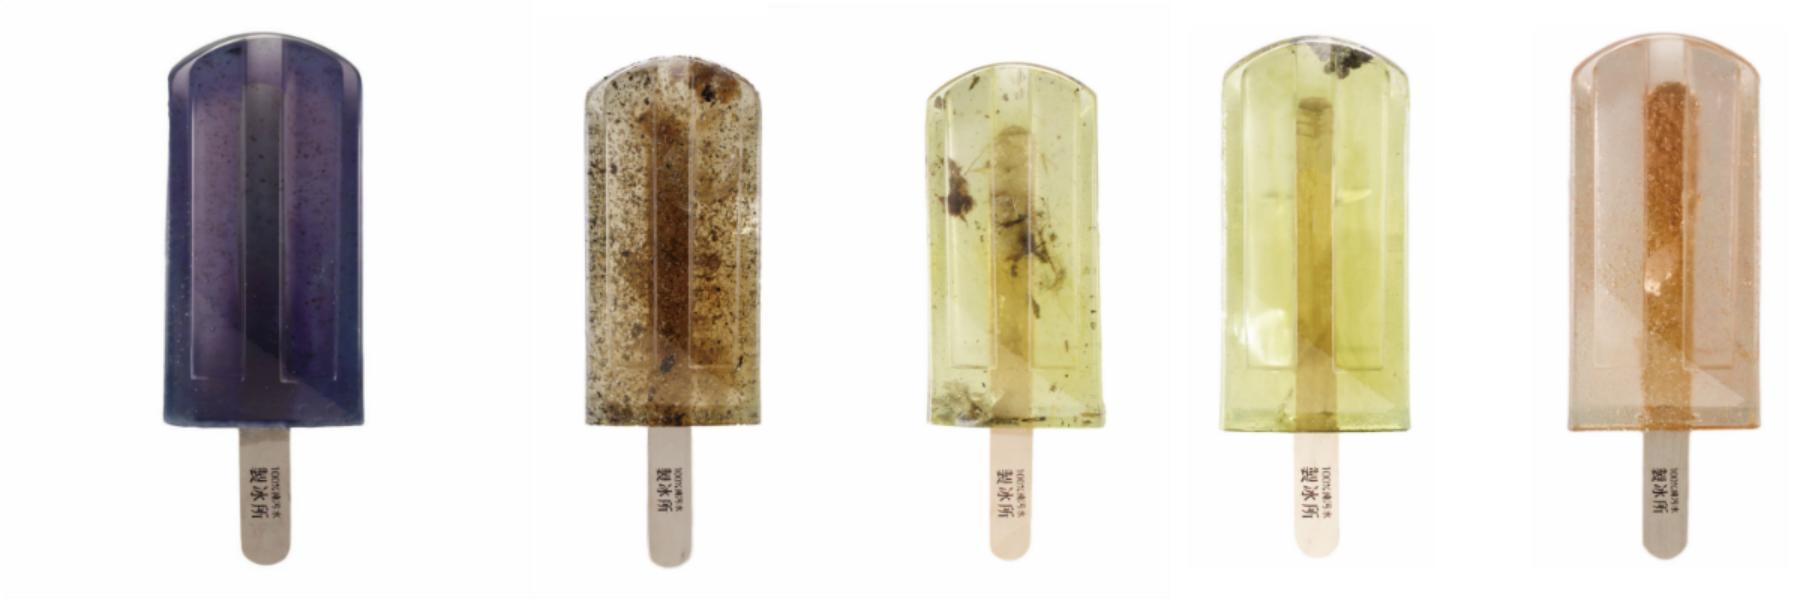 ¿Se te antoja una rica paleta helada?